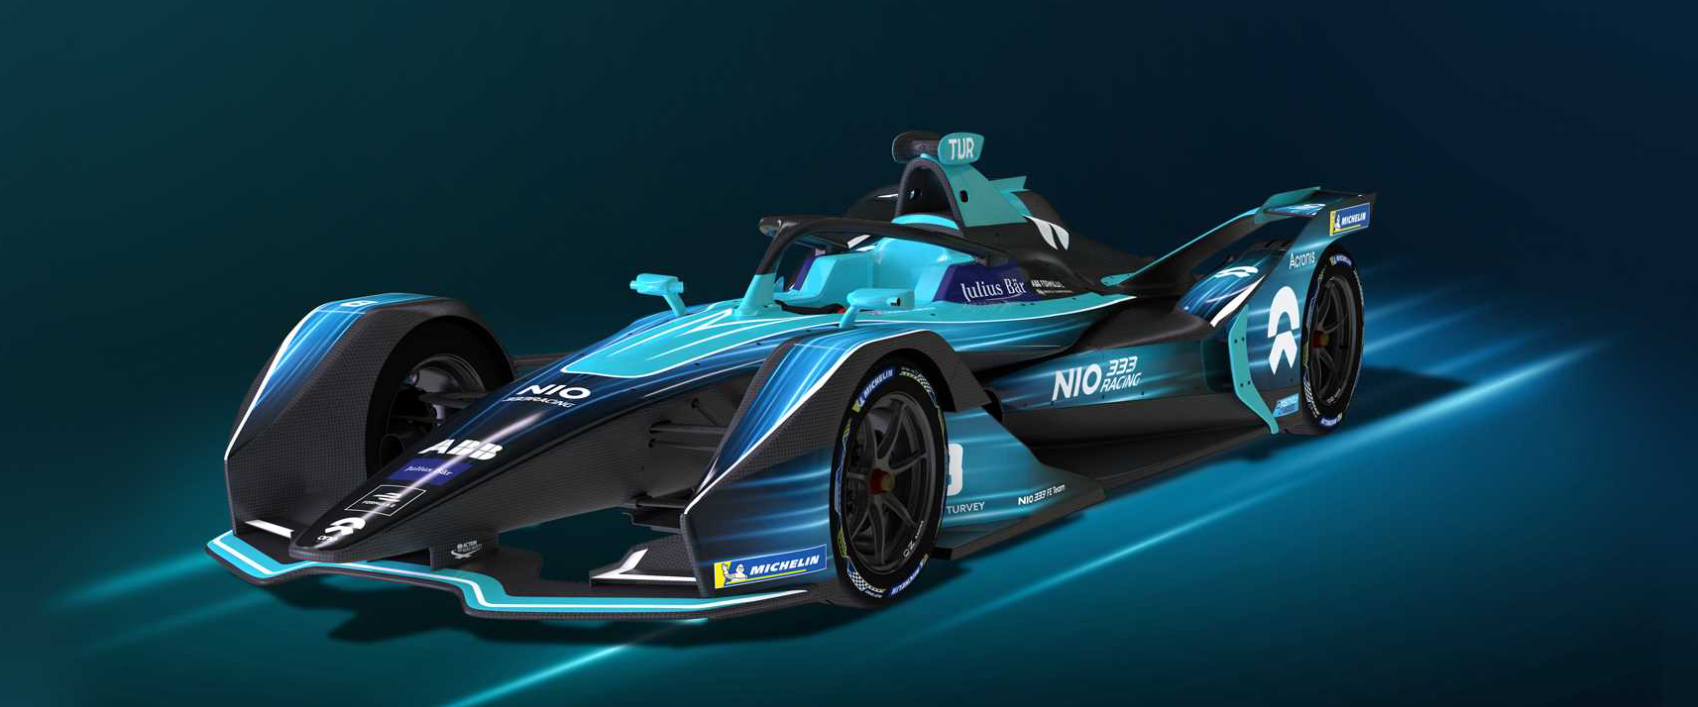 Formule Nio